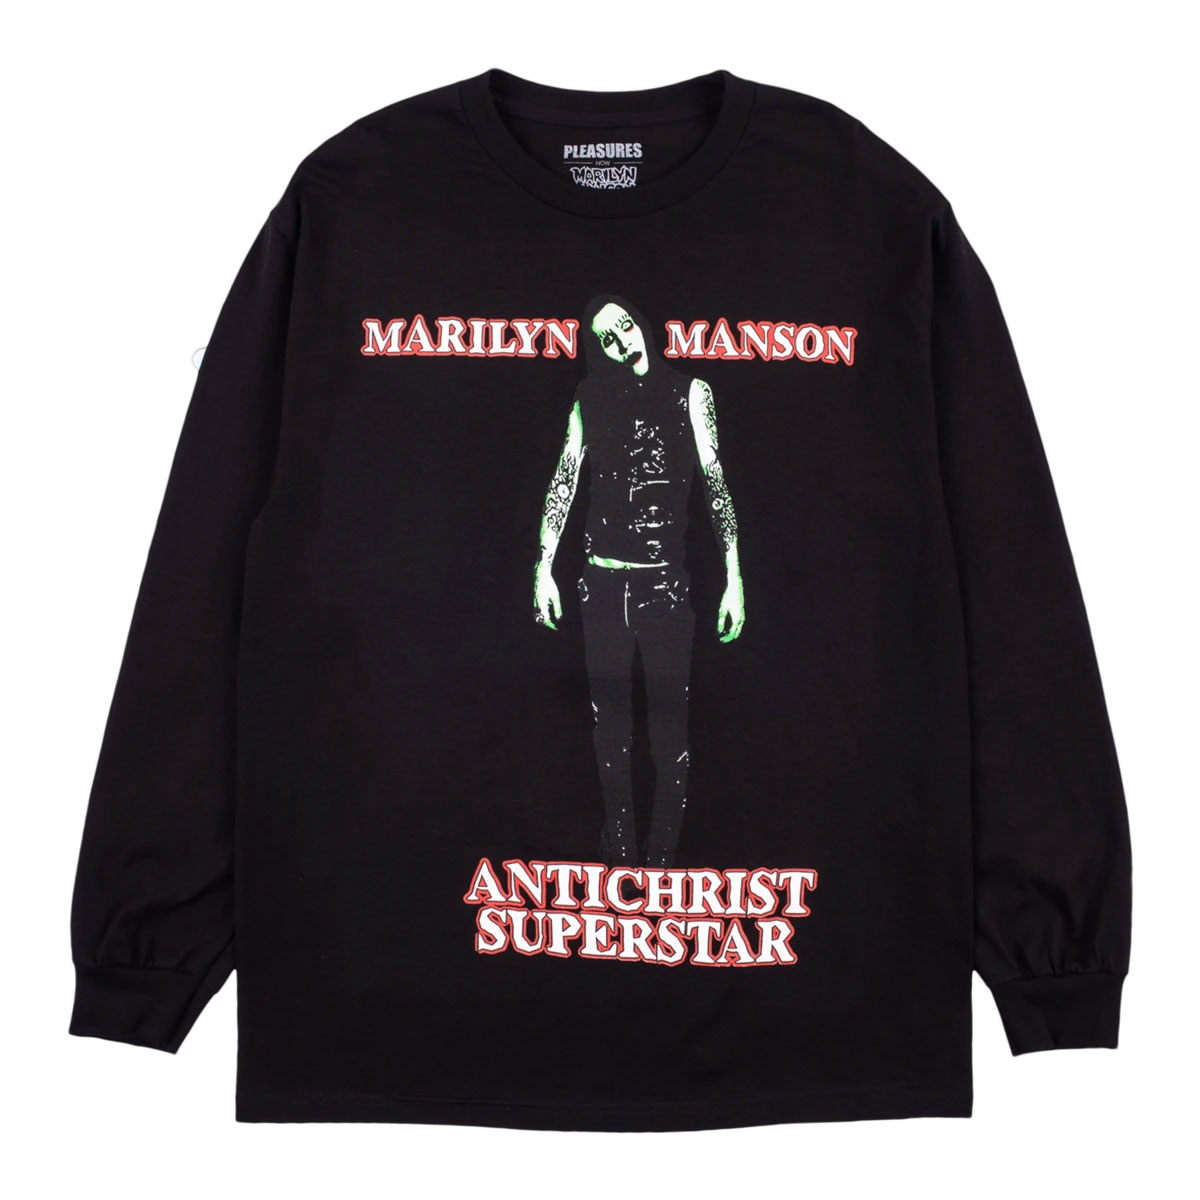 【PLEASURES/プレジャーズ×MARILYN MANSON/マリリン・マンソン】SUPERSTAR LONG SLEEVE ロングTシャツ / BLACK